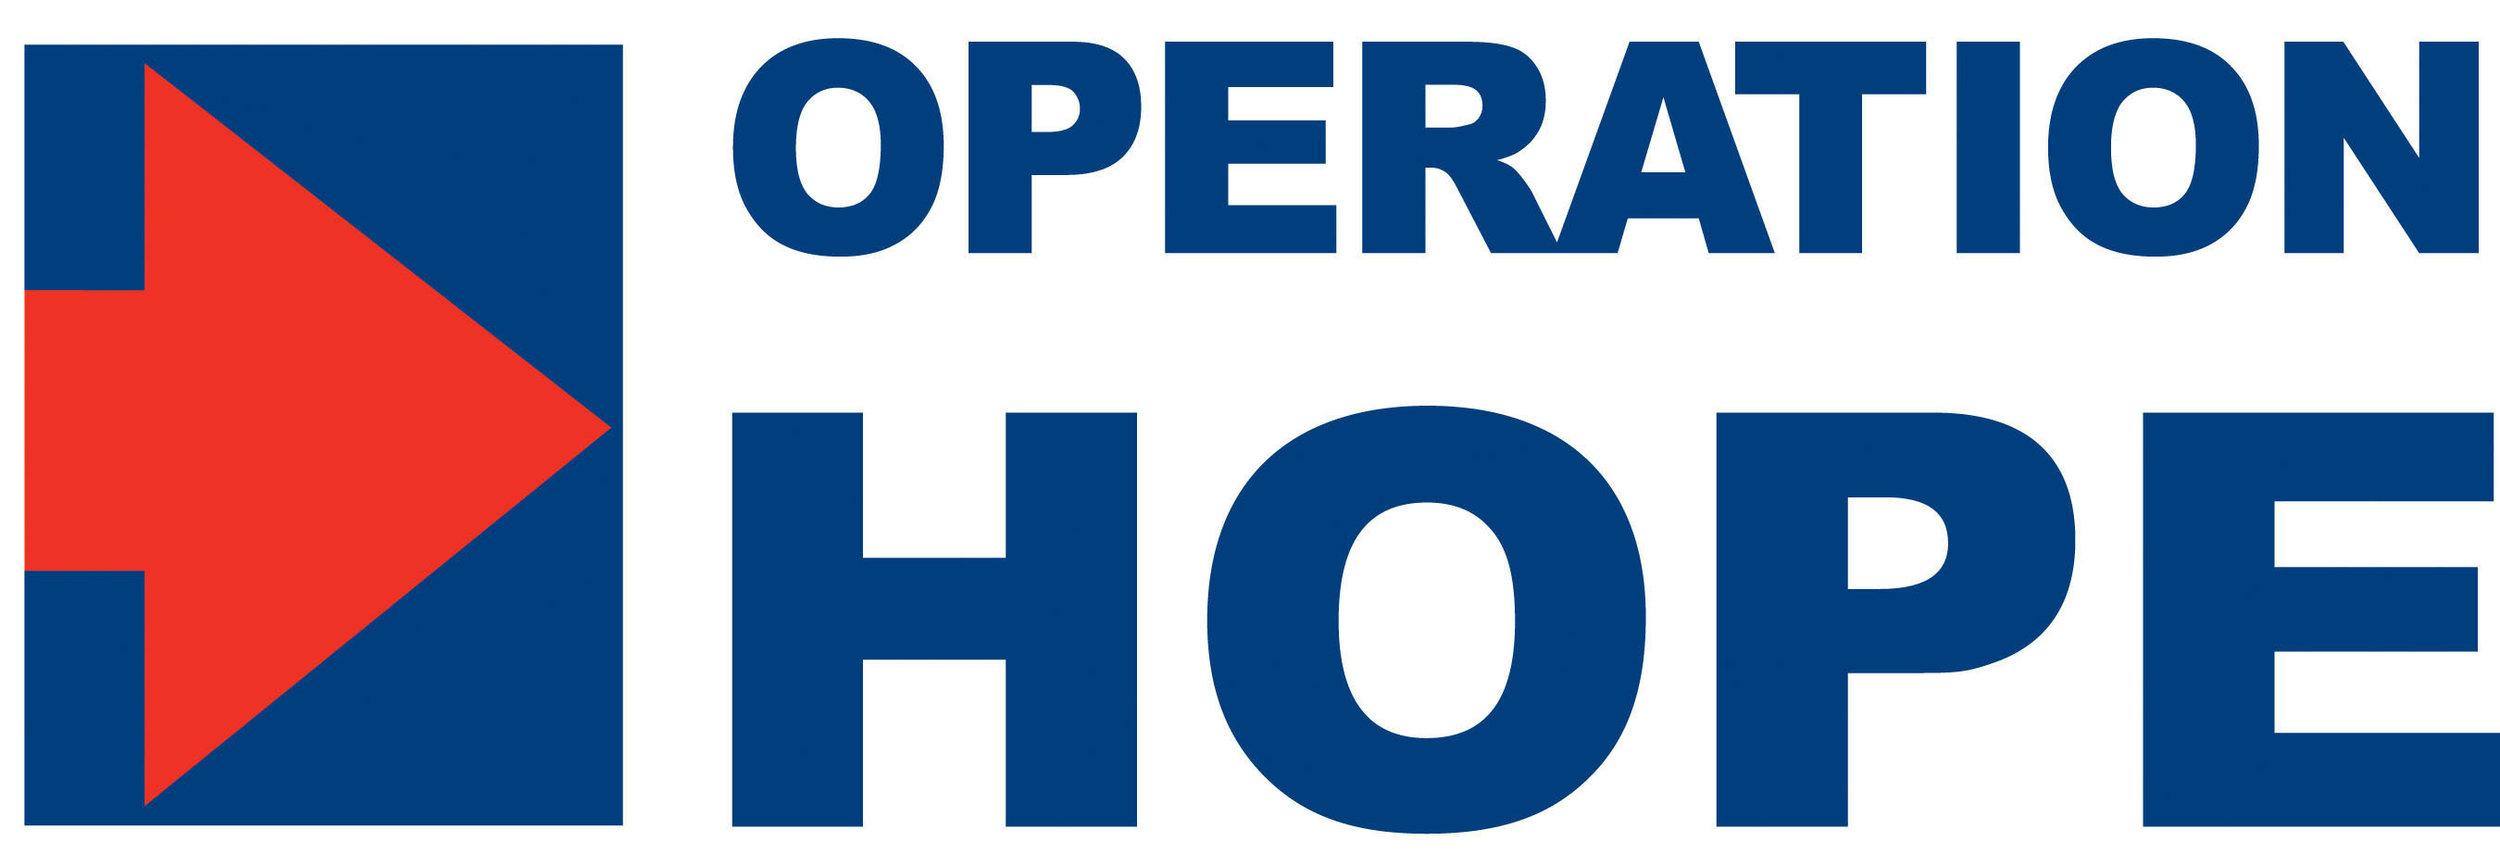 OperationHopePNG.jpg